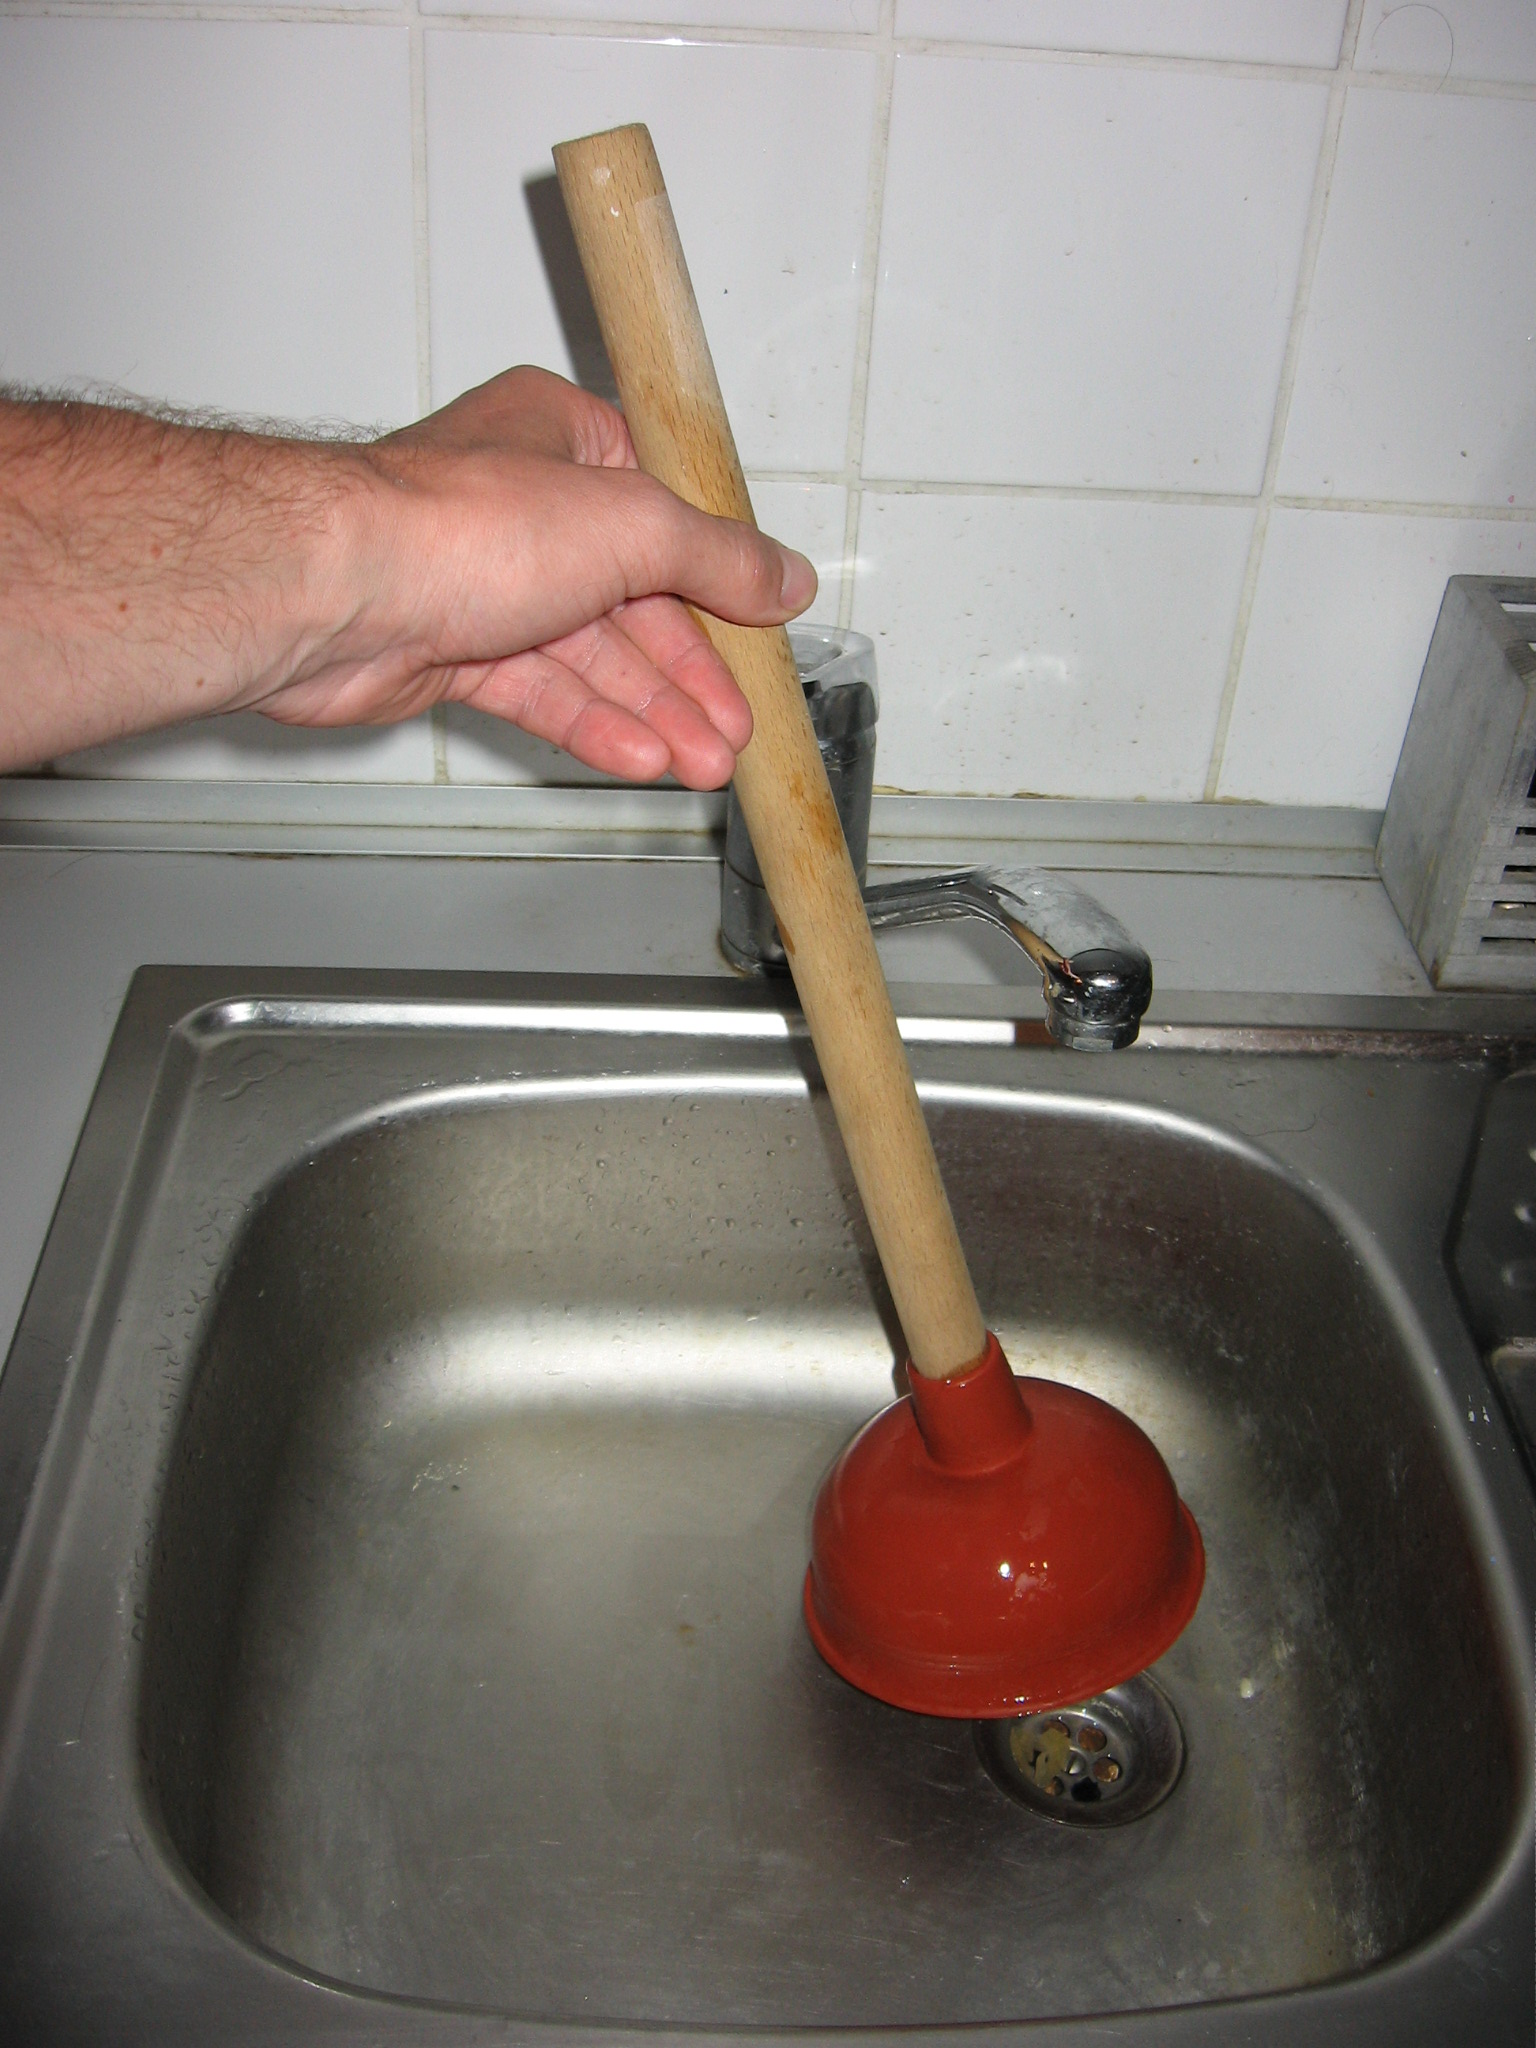 Saugglocke Sanitartechnik Wikipedia